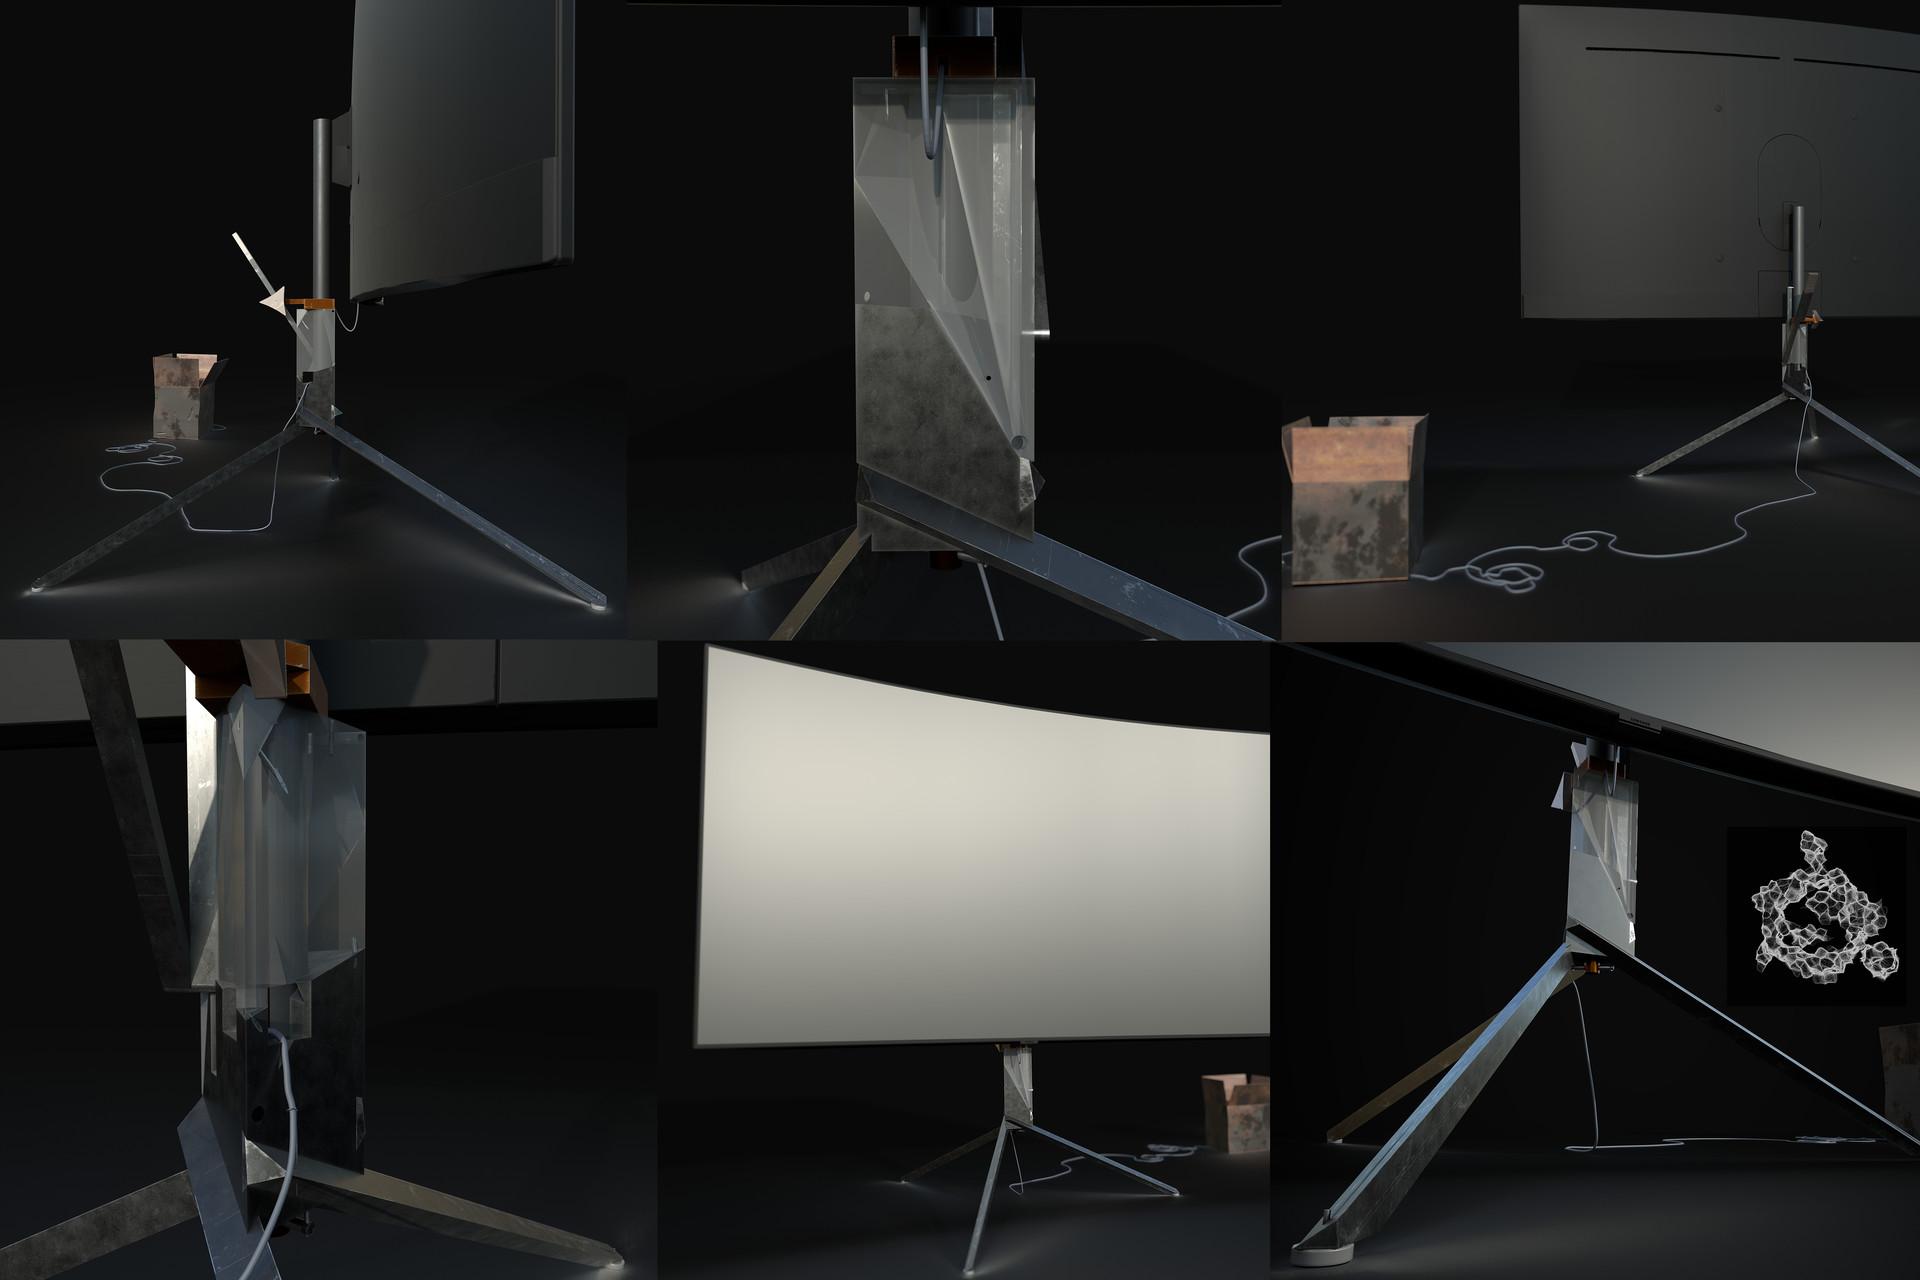 monitor stand board 2